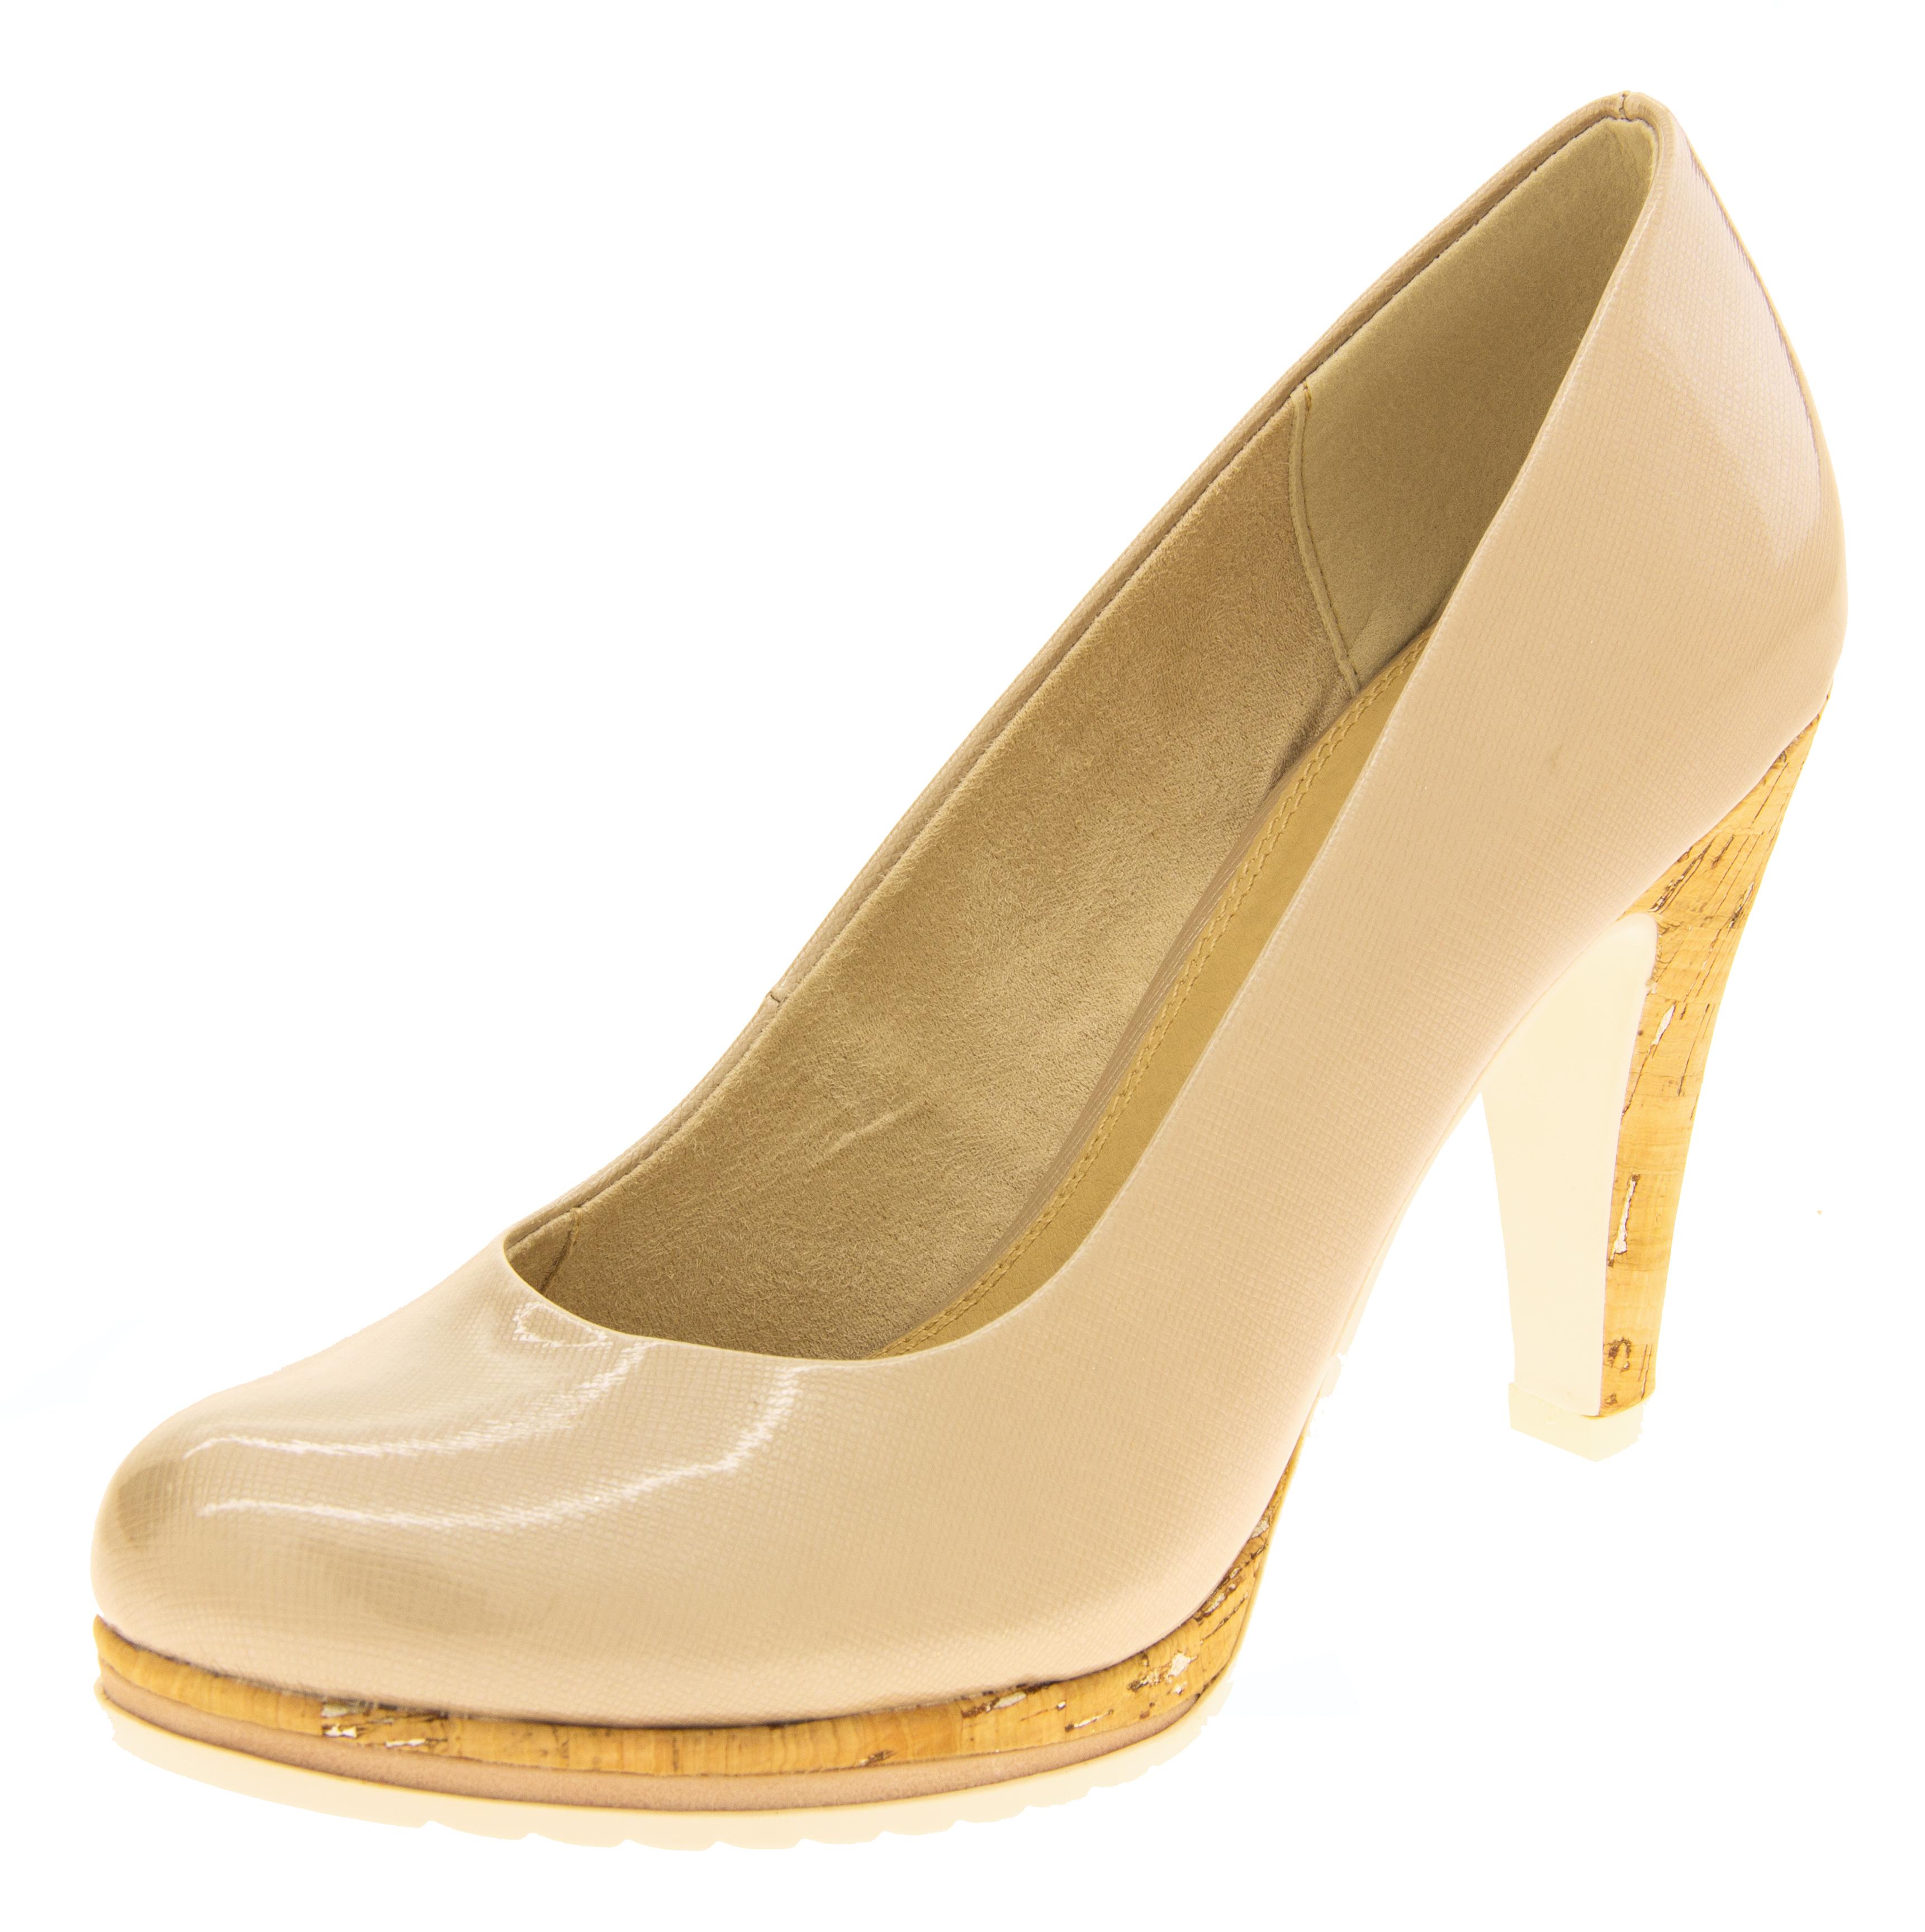 990fa7dd3f7da Womens Marco Tozzi High Heel Court Shoes | Womens, Mens, Kids Shoes |  Heels, Trainers & Boots | Footwear Studio